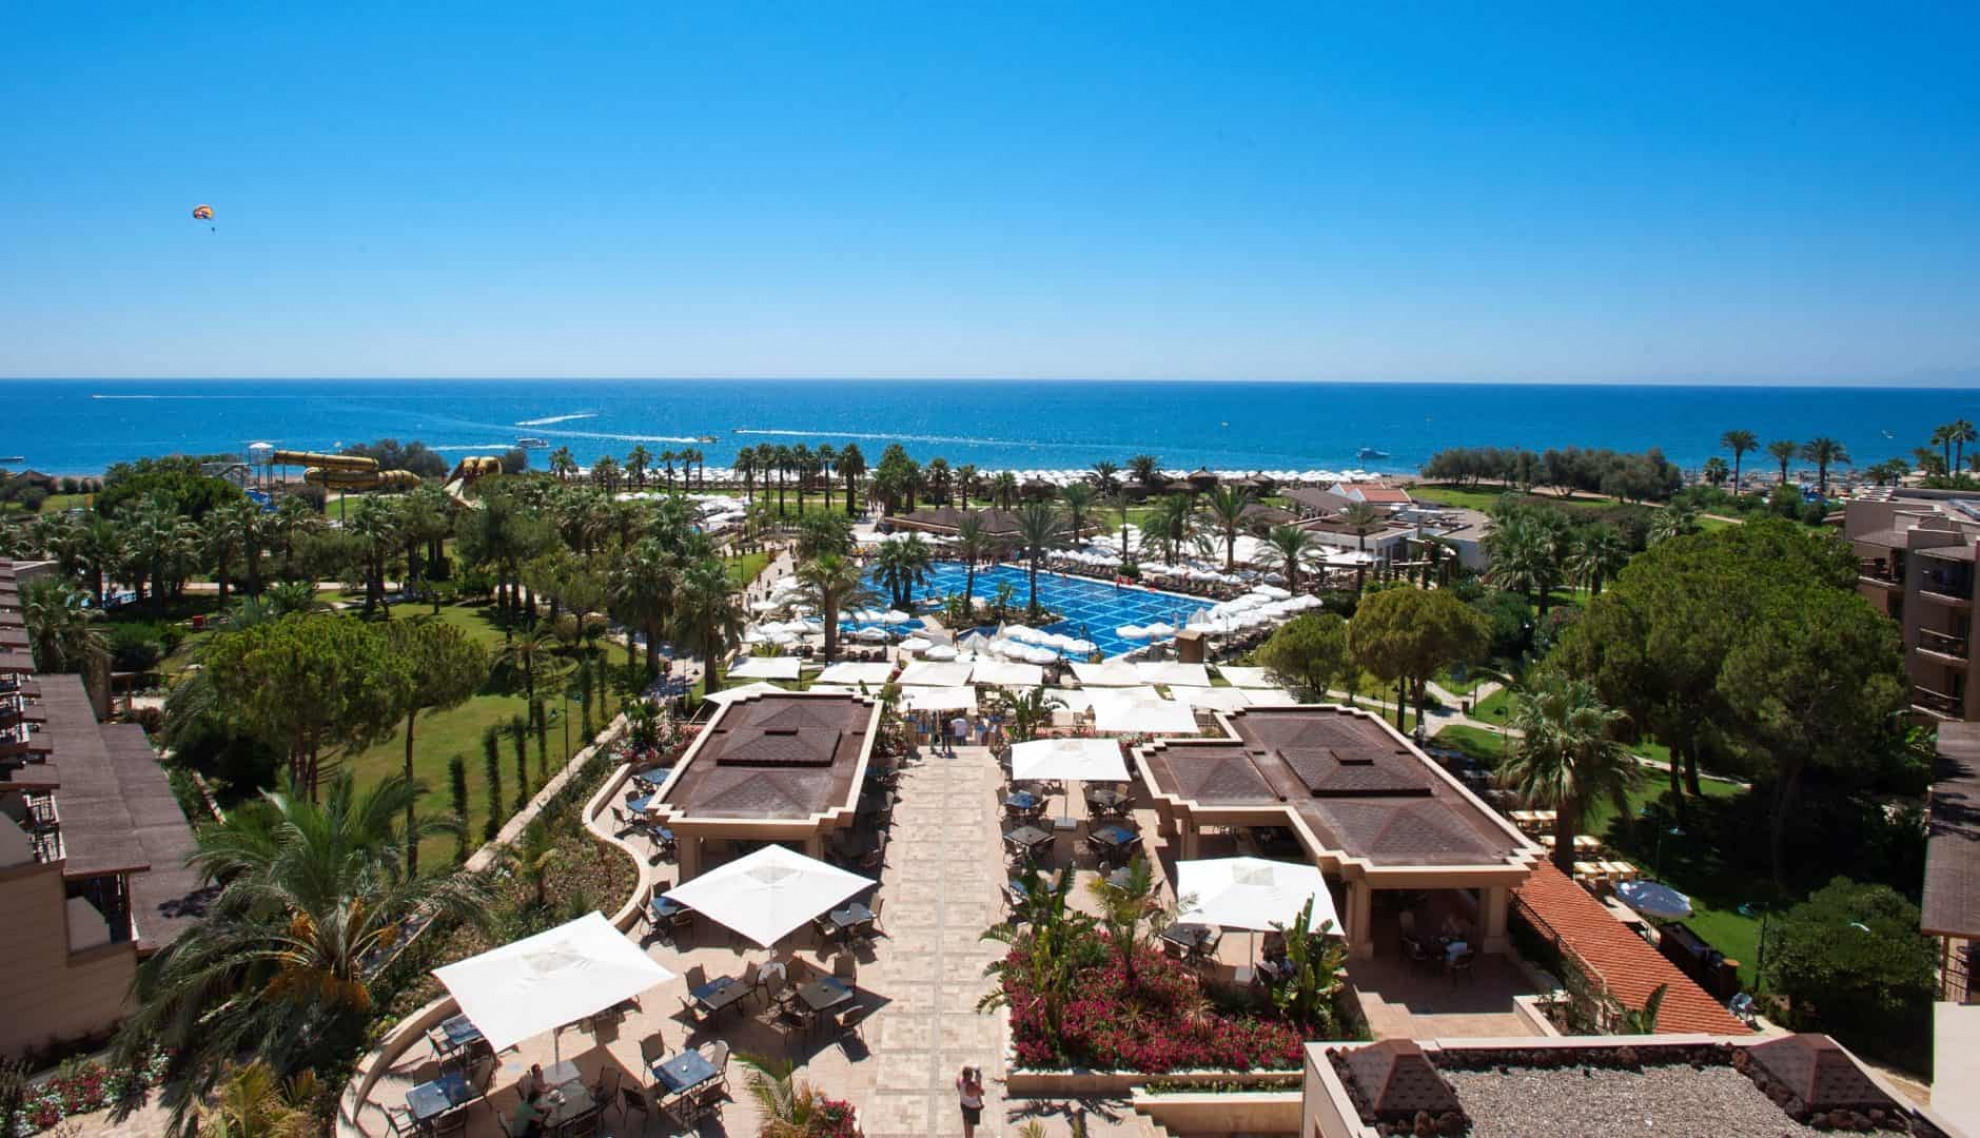 Crystal Tat Beach Golf Resort And Spa Antalya